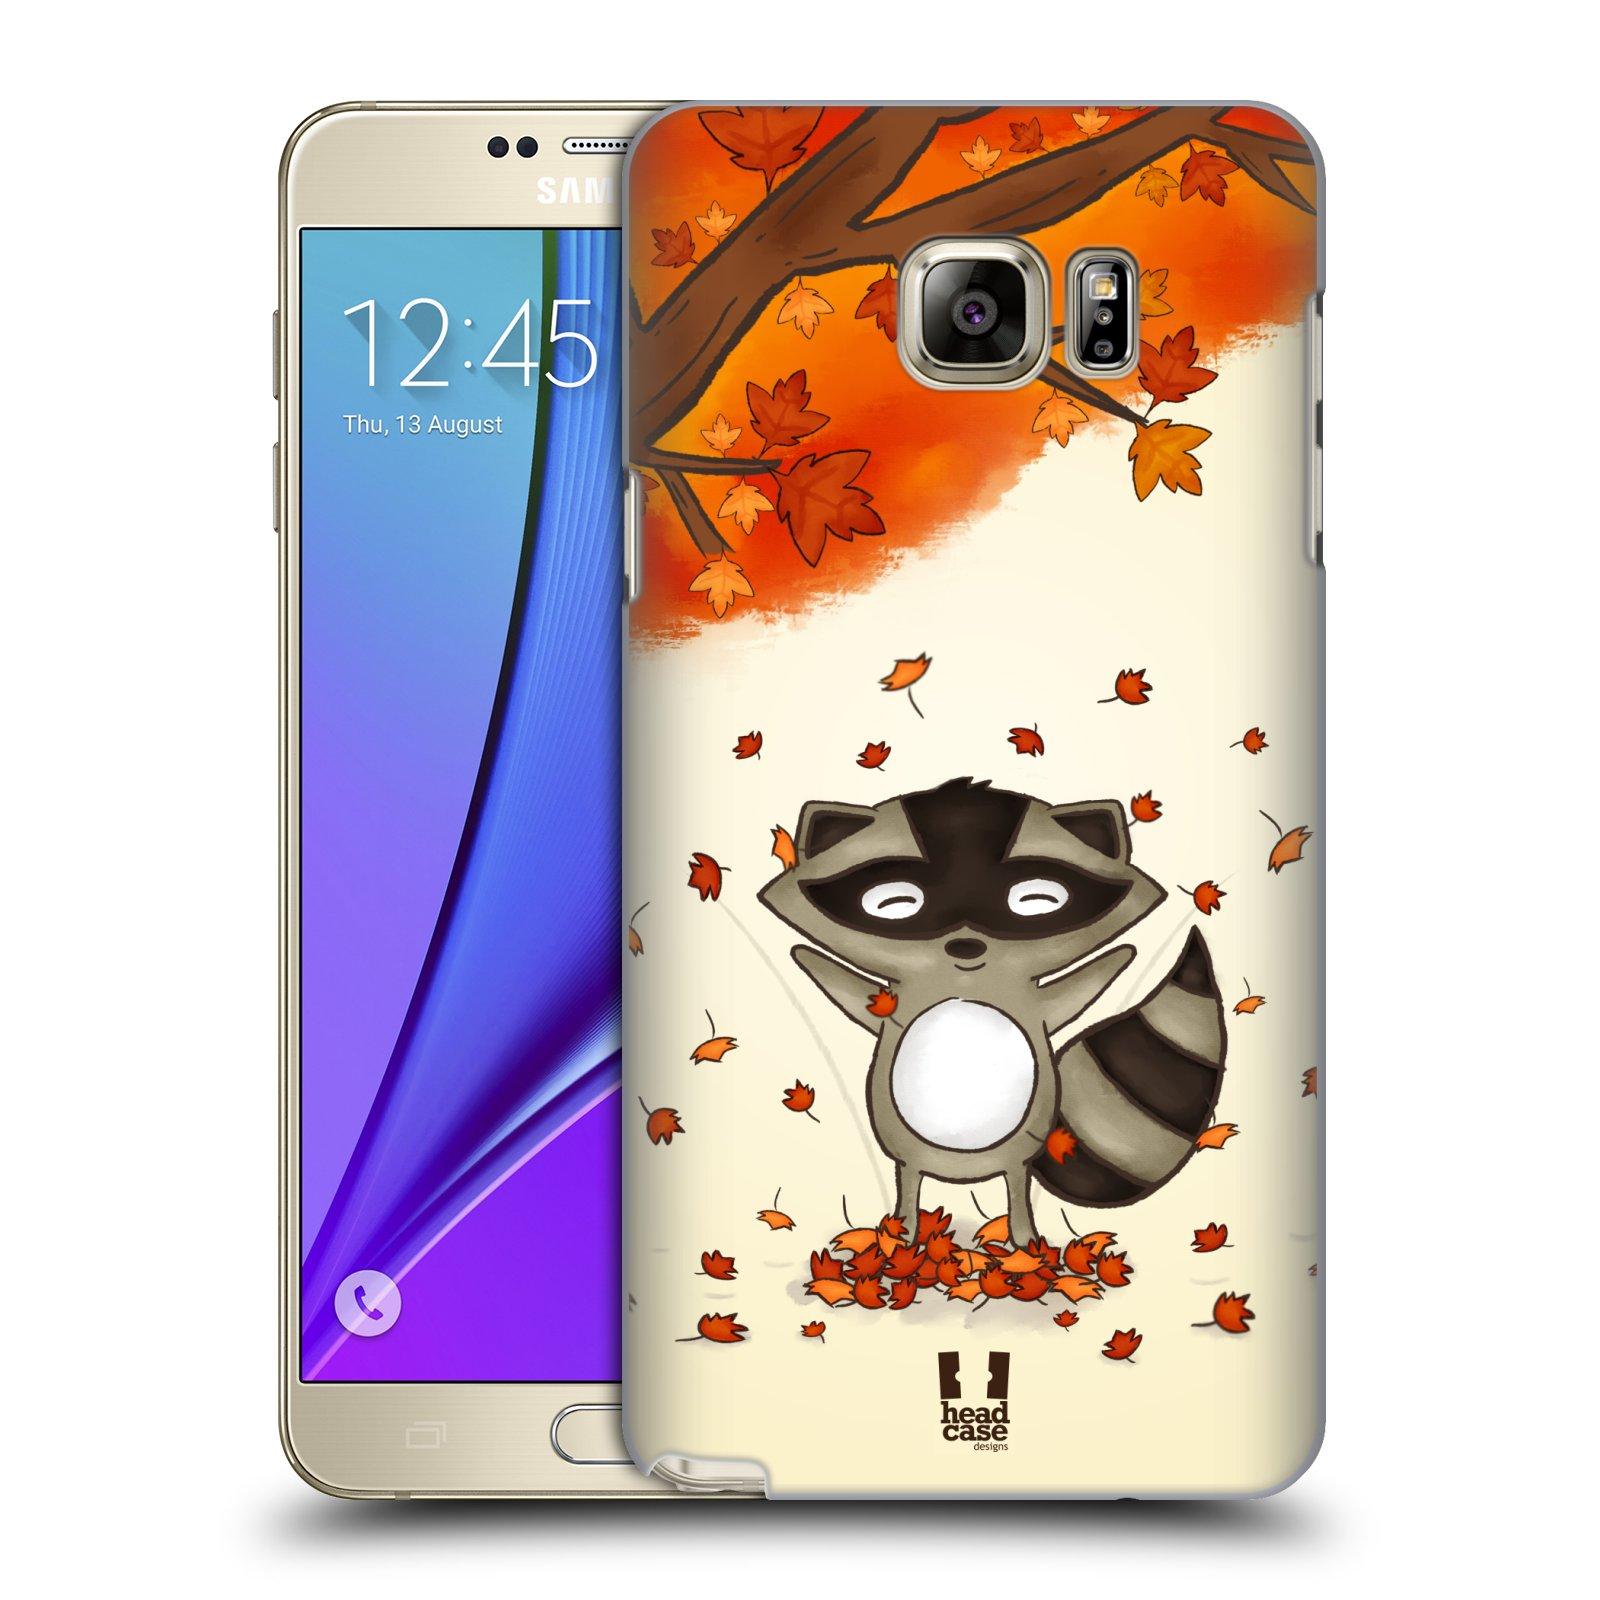 HEAD CASE plastový obal na mobil SAMSUNG Galaxy Note 5 (N920) vzor podzimní zvířátka mýval